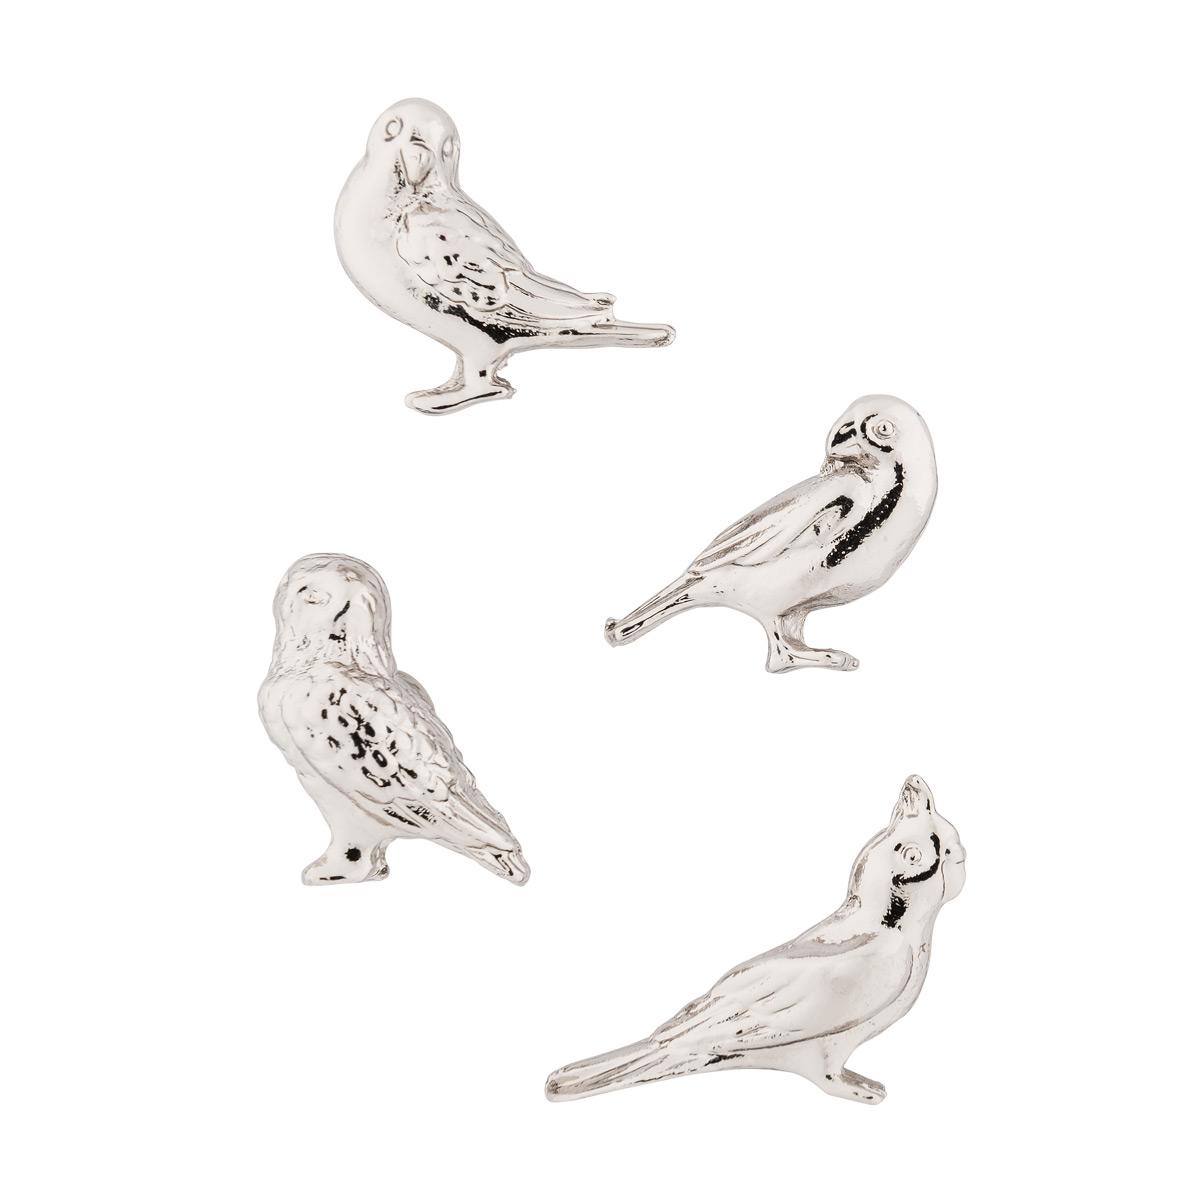 Bird Cast Iron Magnets